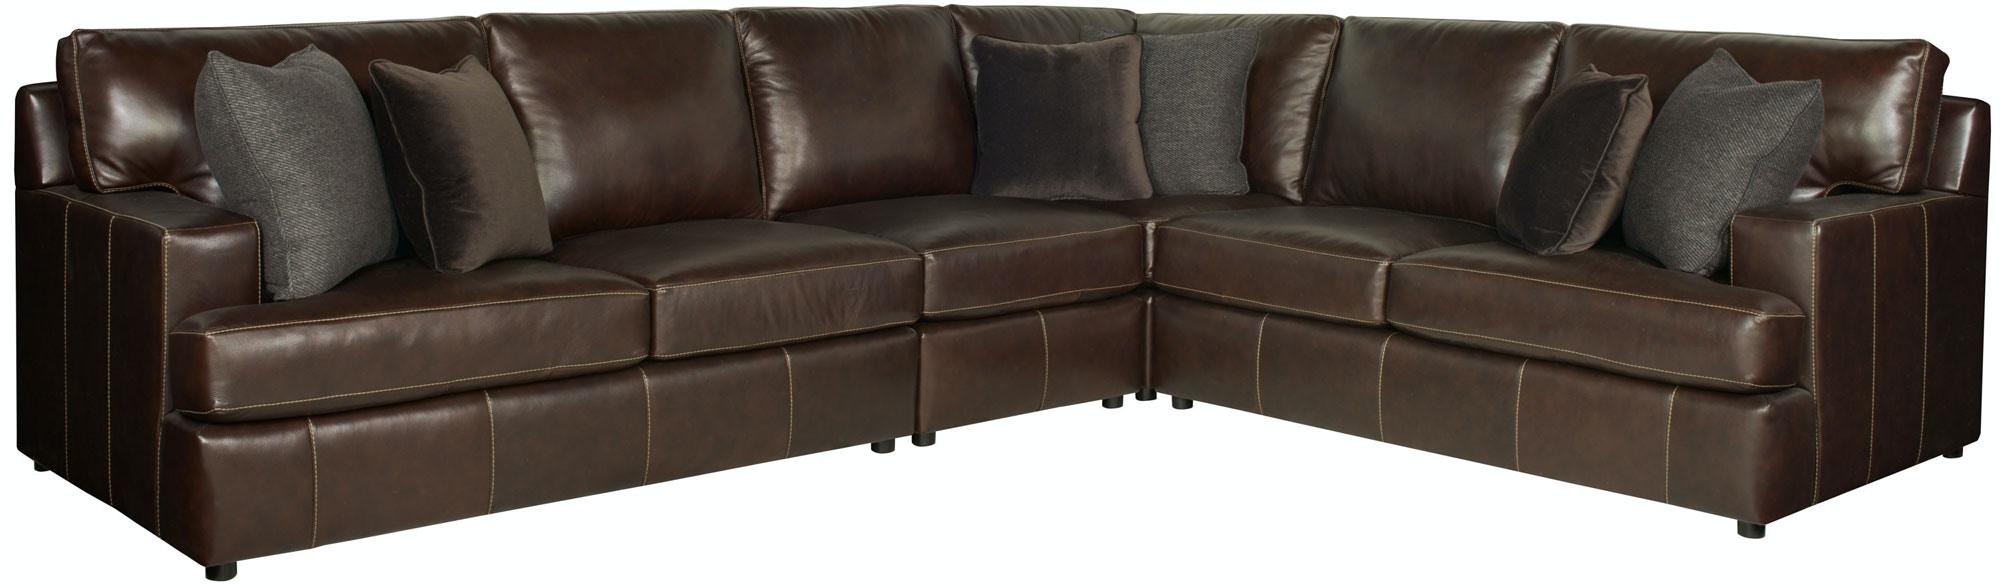 Bernhardt Furniture Winslow Sectional 3441L, 3442L, 3432L, 3430L